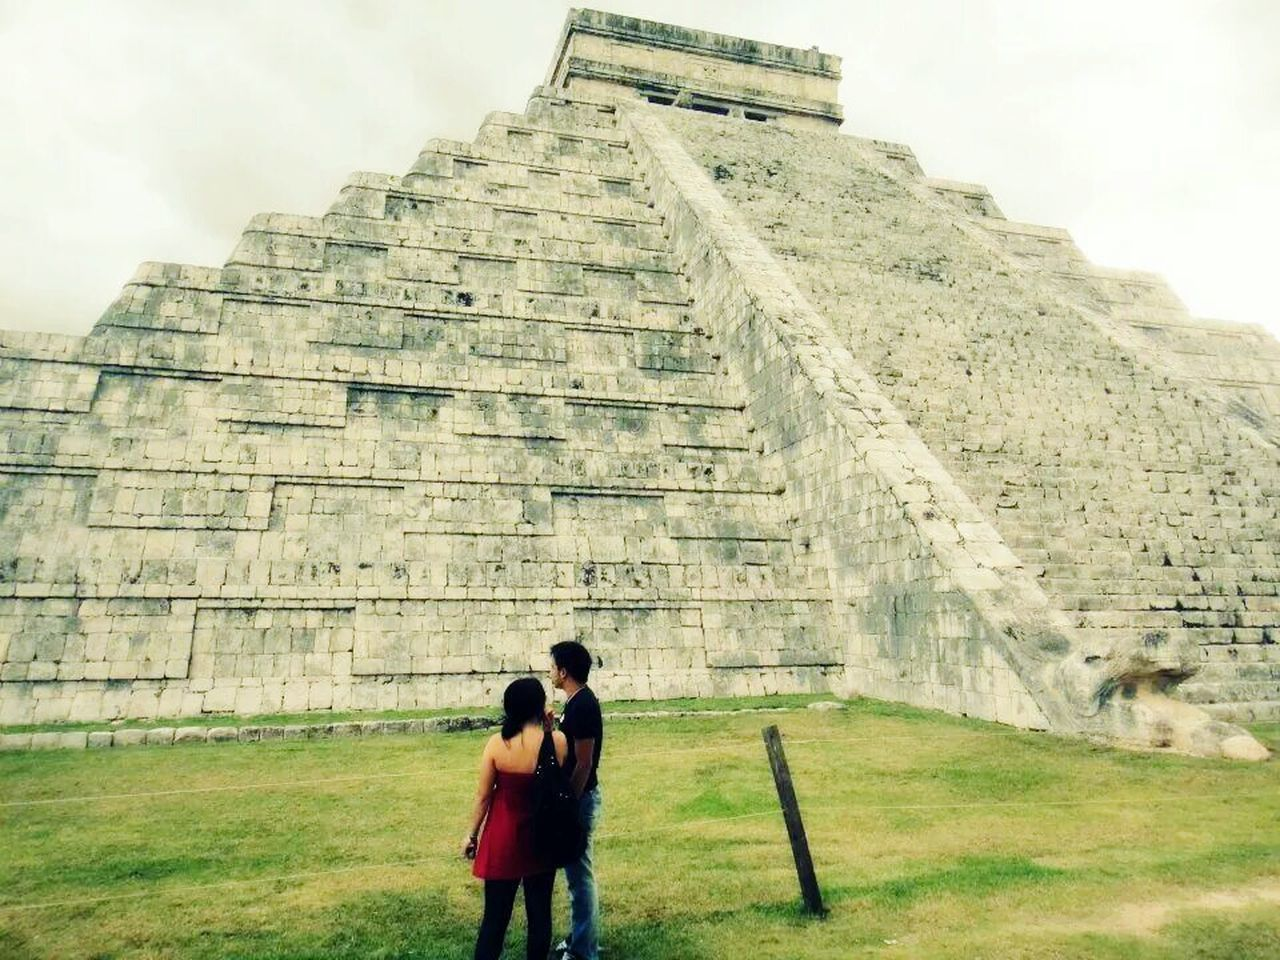 Mexico Chichen Itza Trip Traveling Piramid People Photo Peoplephotography Yucatan Mexico Boyfriend